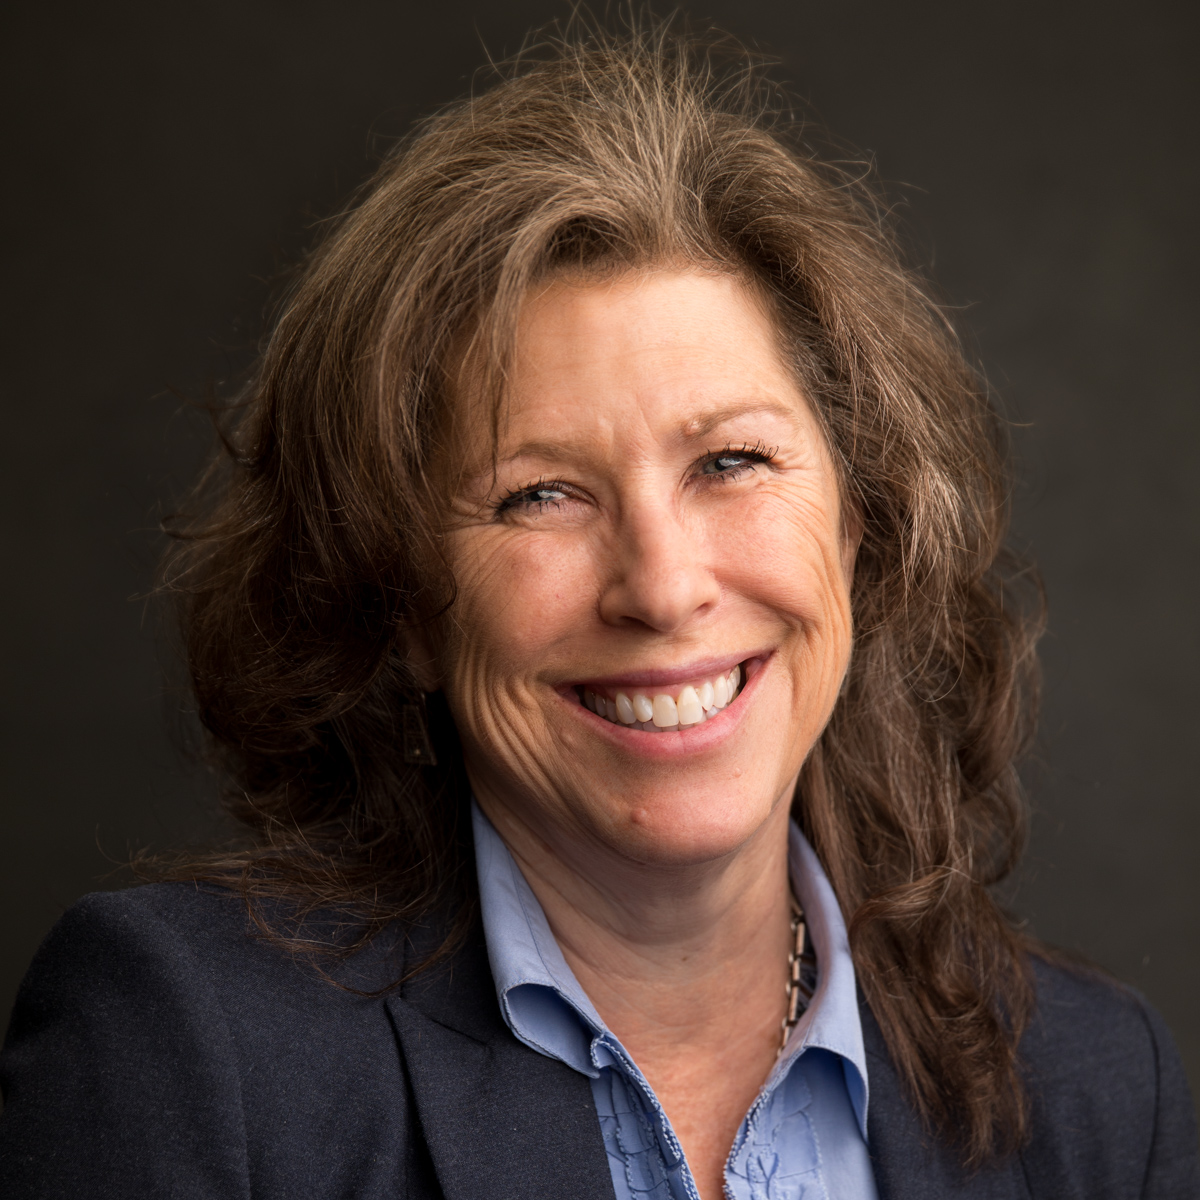 Laura Moore, RLA - Director of Marketing | Senior Landscape Architect